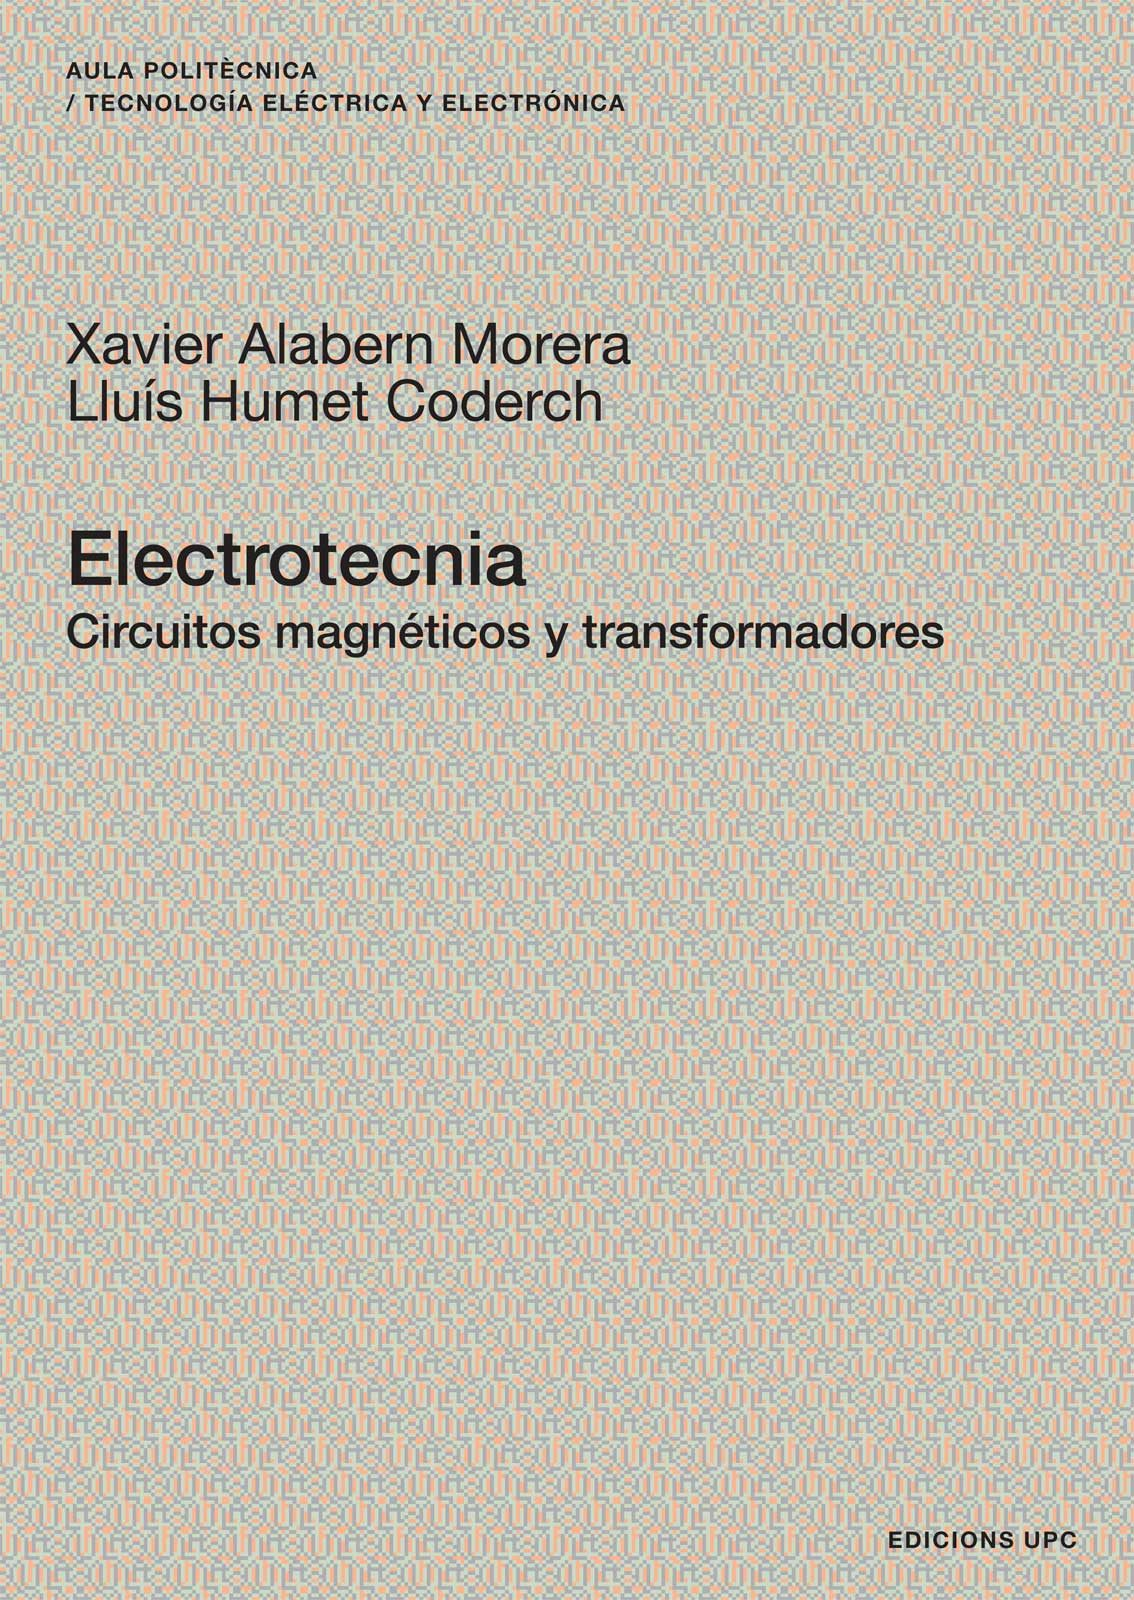 Electrotecnia Circuitos Magneticos Y Transformadores por Xavier Alabern Morera